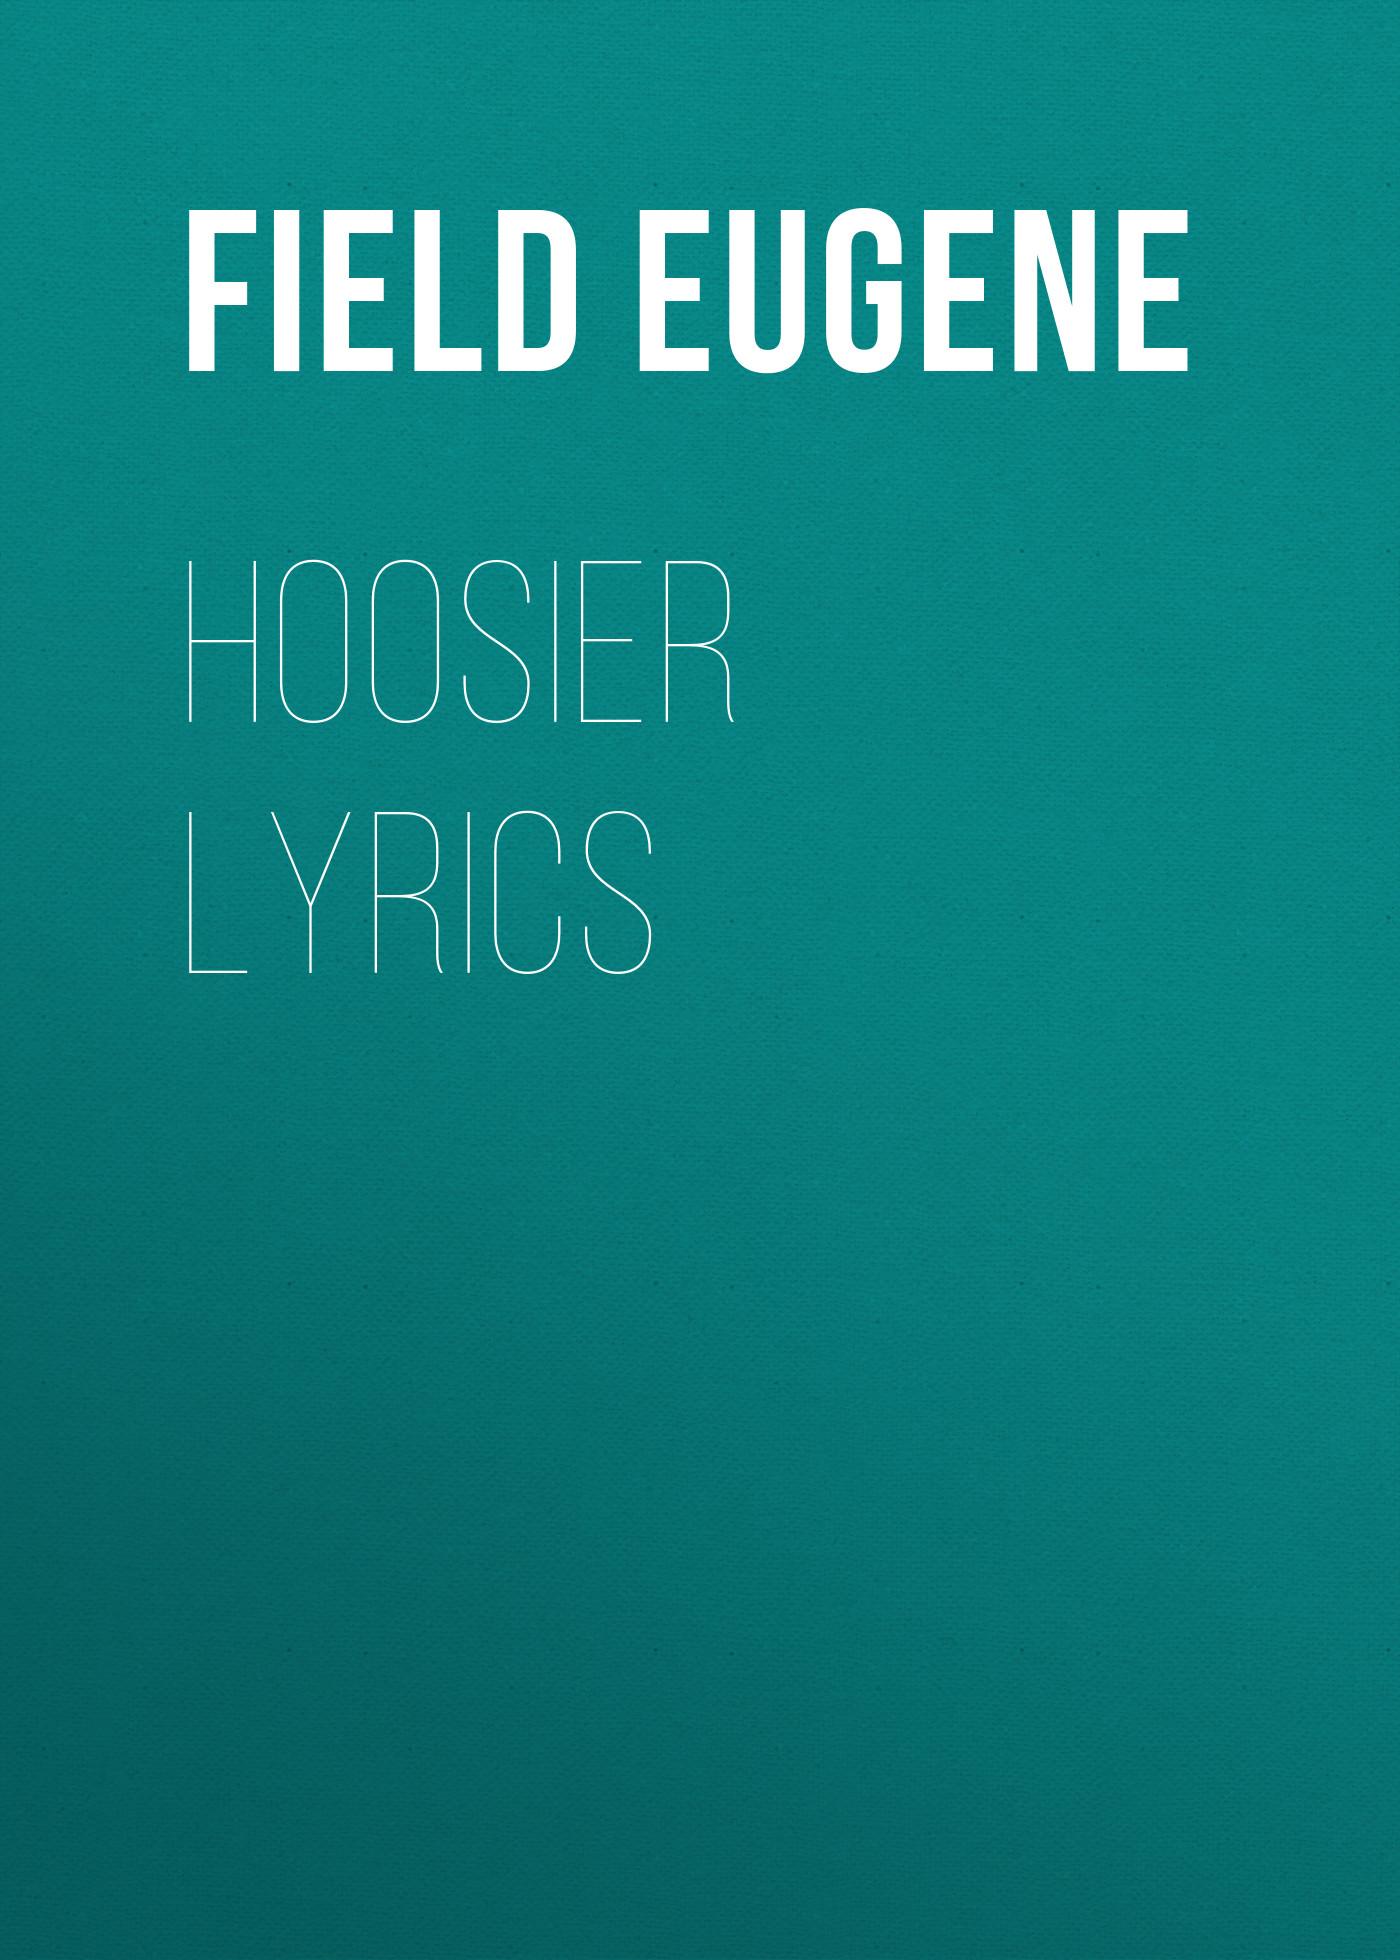 Field Eugene Hoosier Lyrics lyrics volume 1